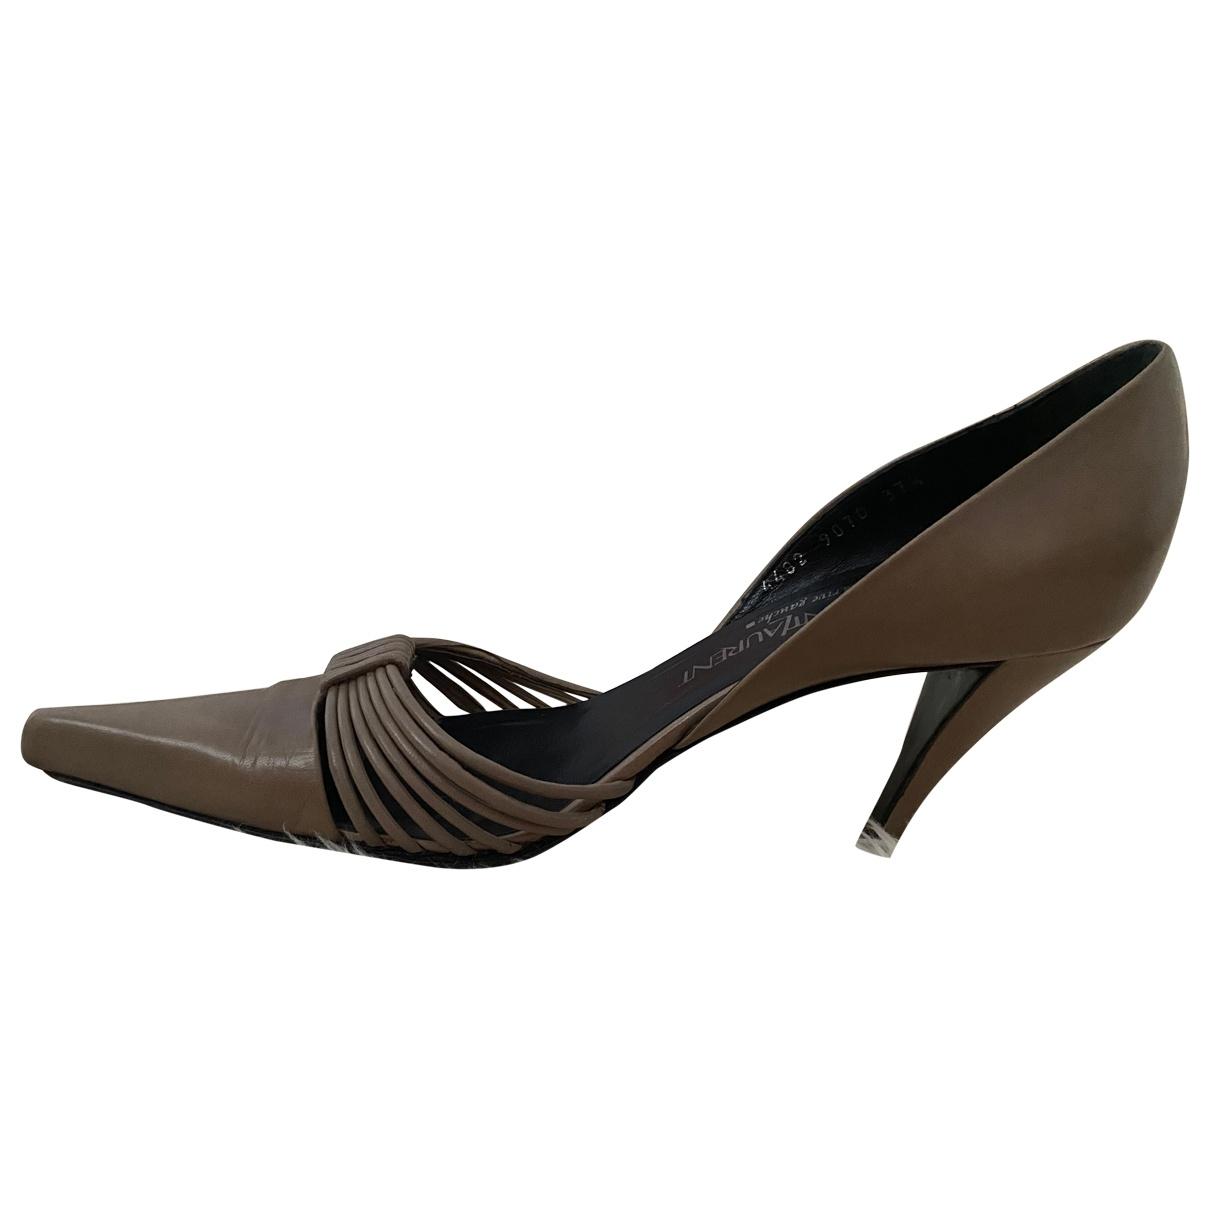 Yves Saint Laurent \N Beige Leather Heels for Women 37.5 EU